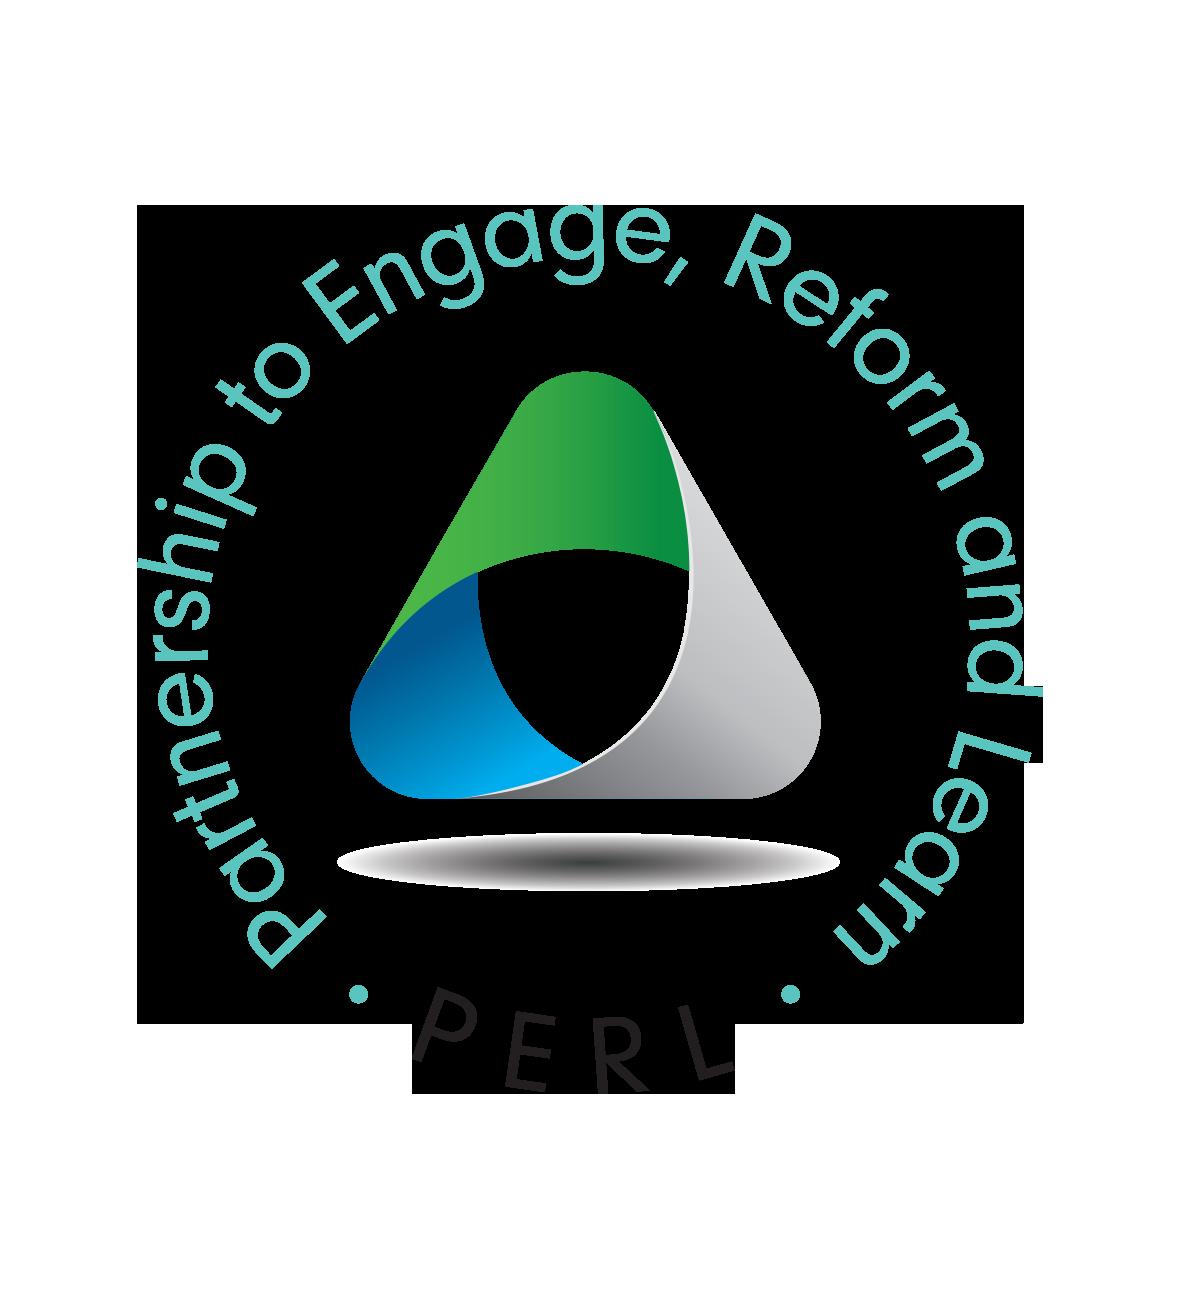 PERL logo white.png